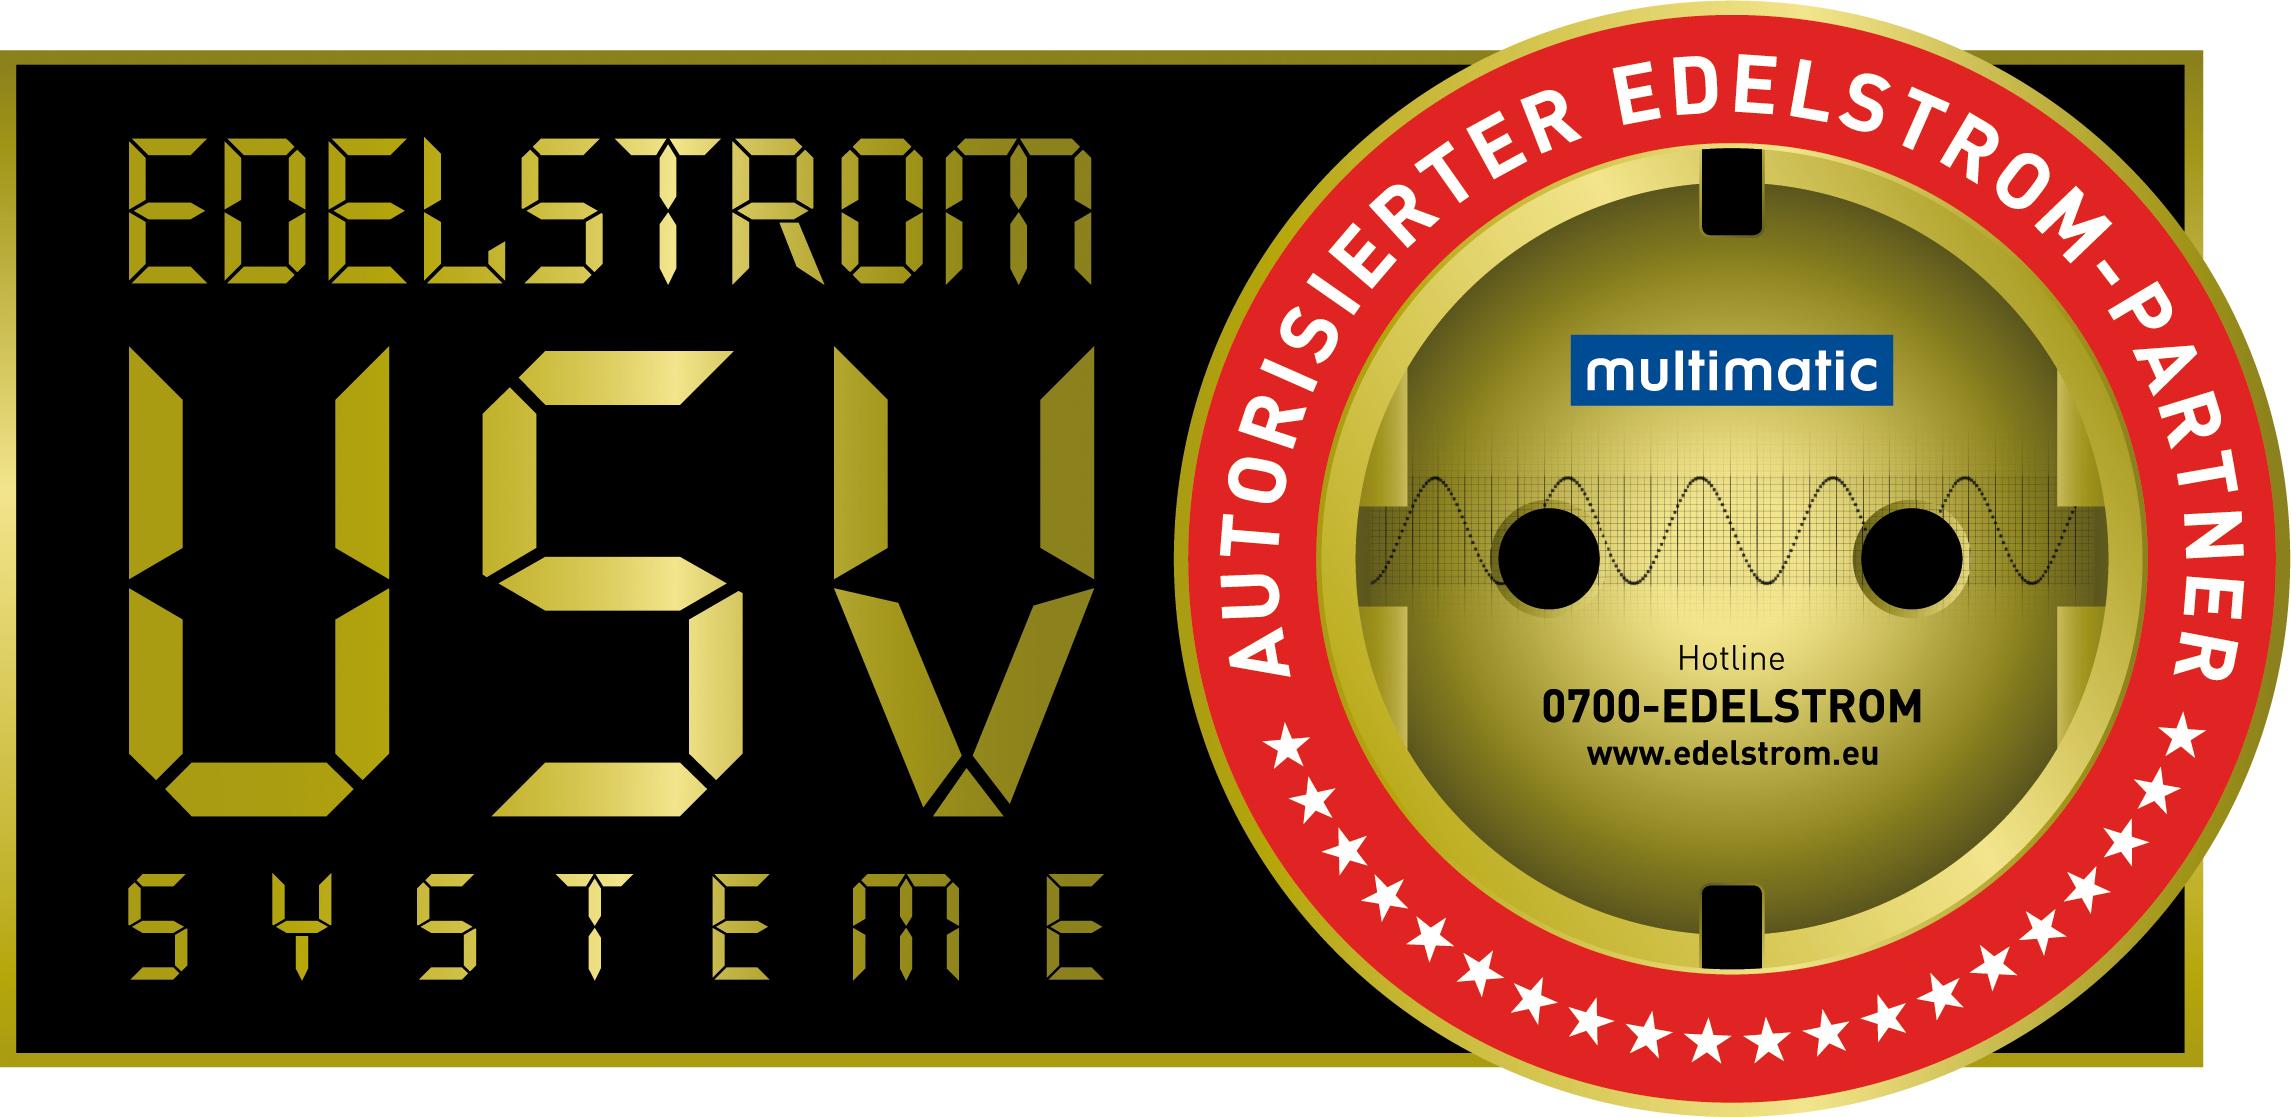 Multimatic Edelstrom Partner